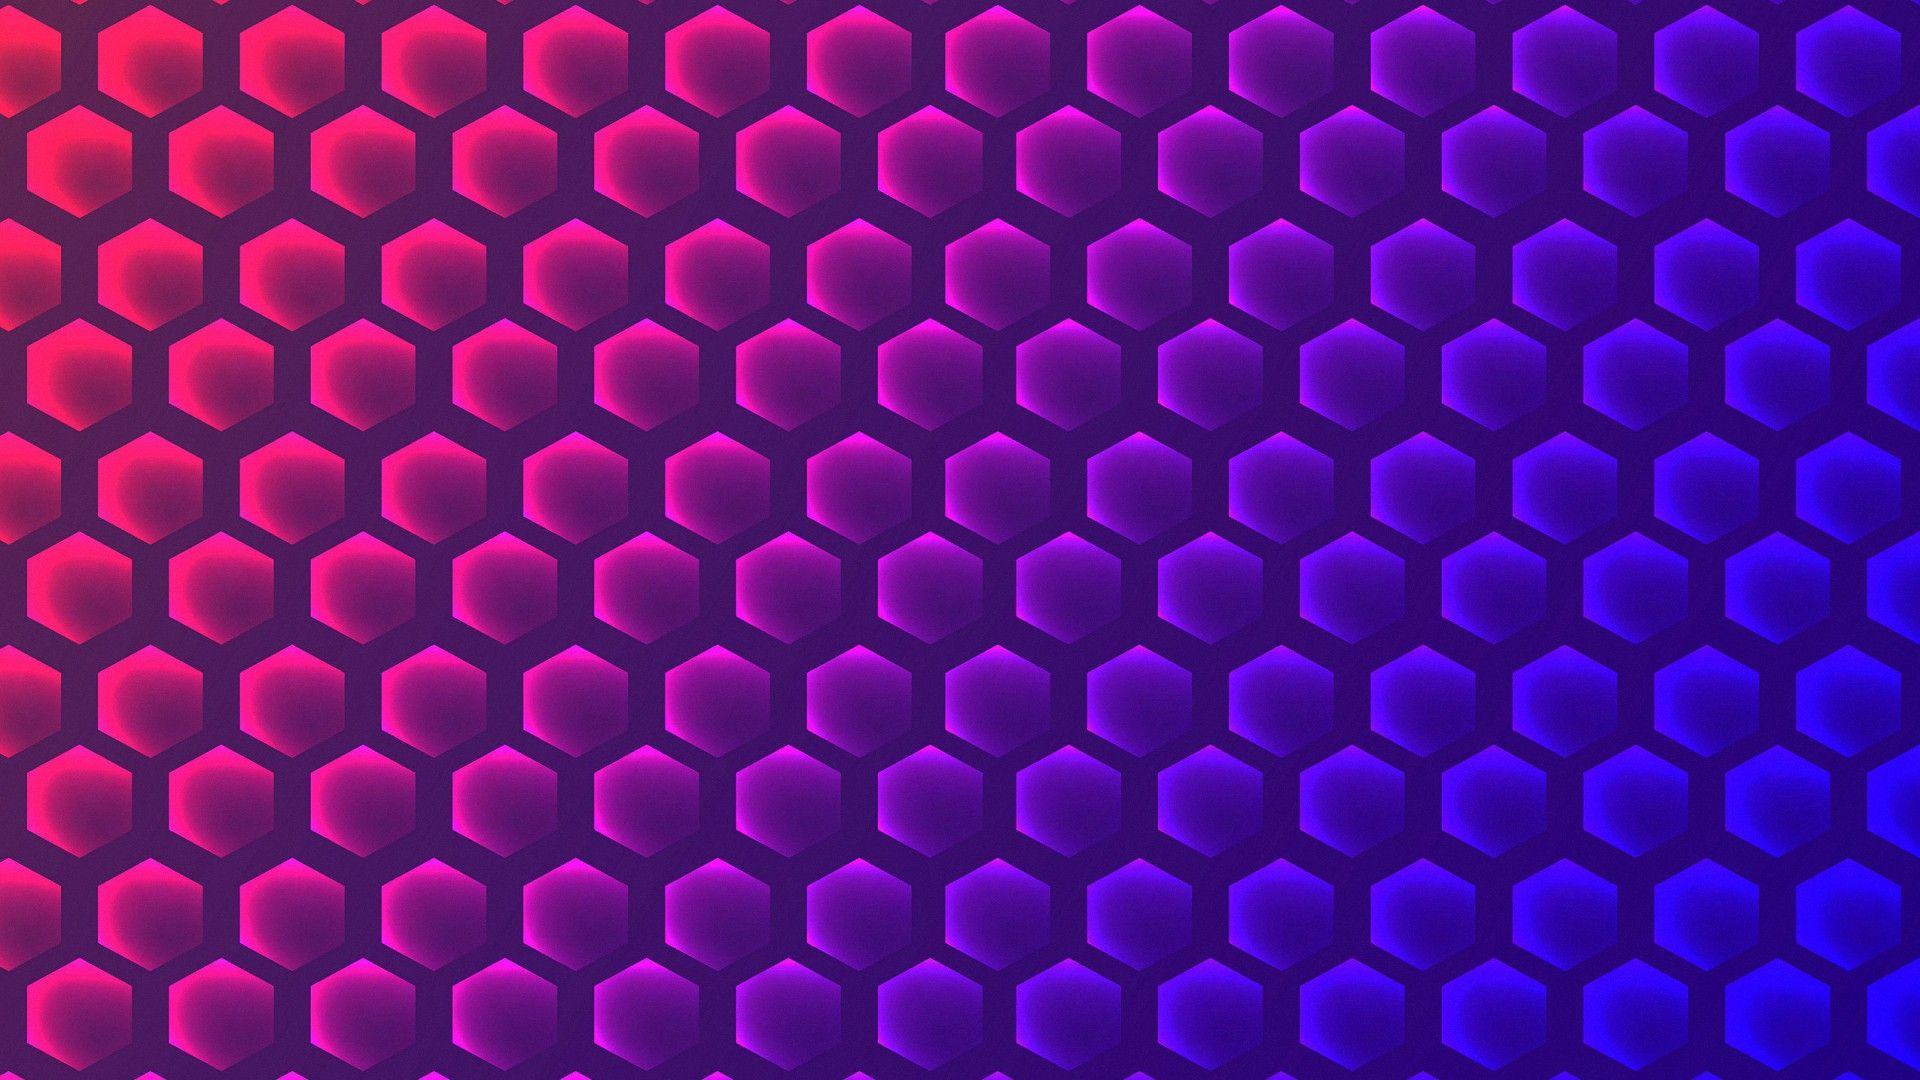 Hex free download wallpaper